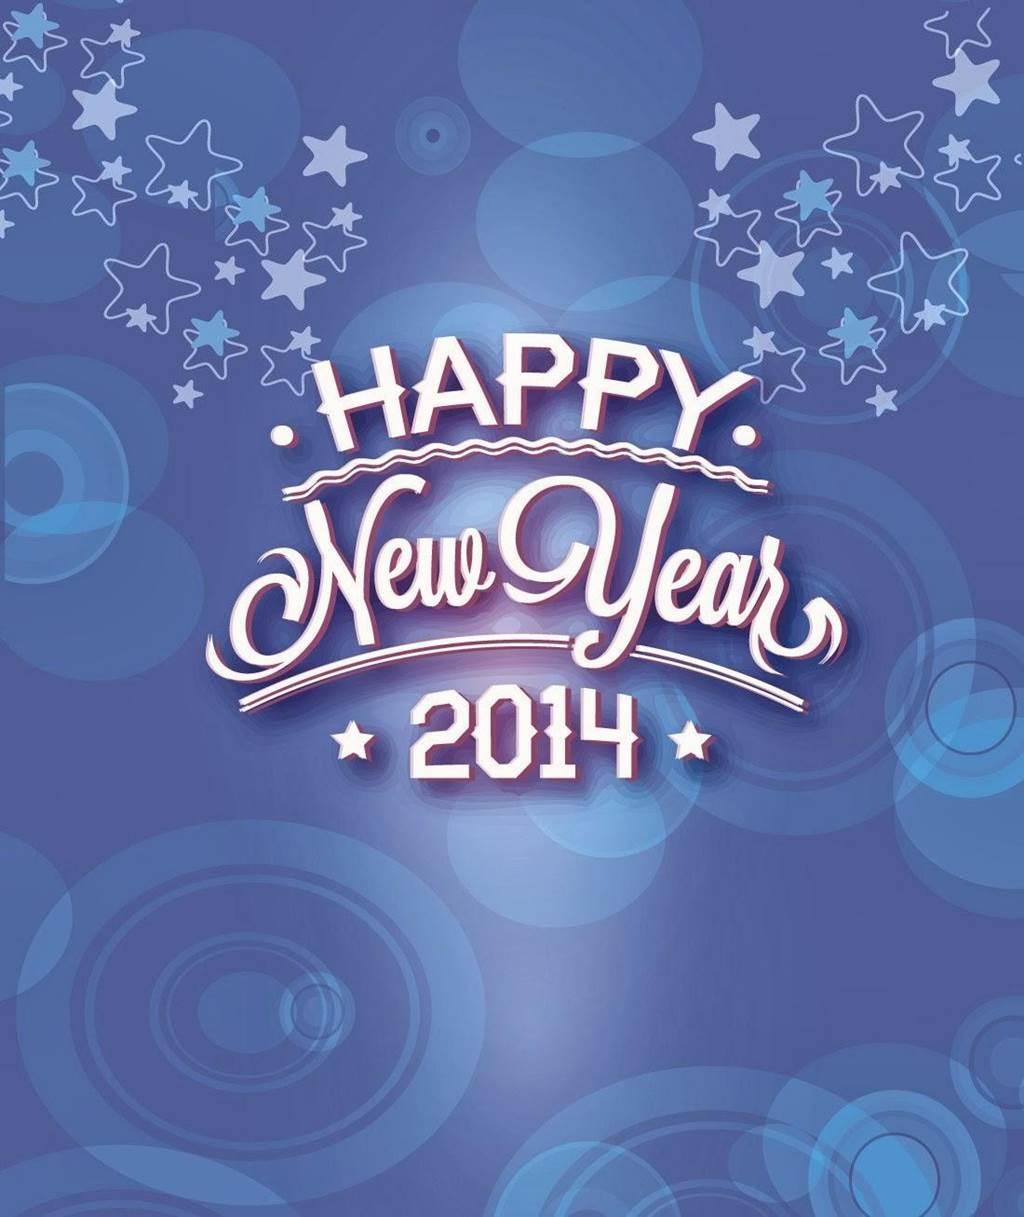 happy new year 2014 wishing greeting cards  xcitefun